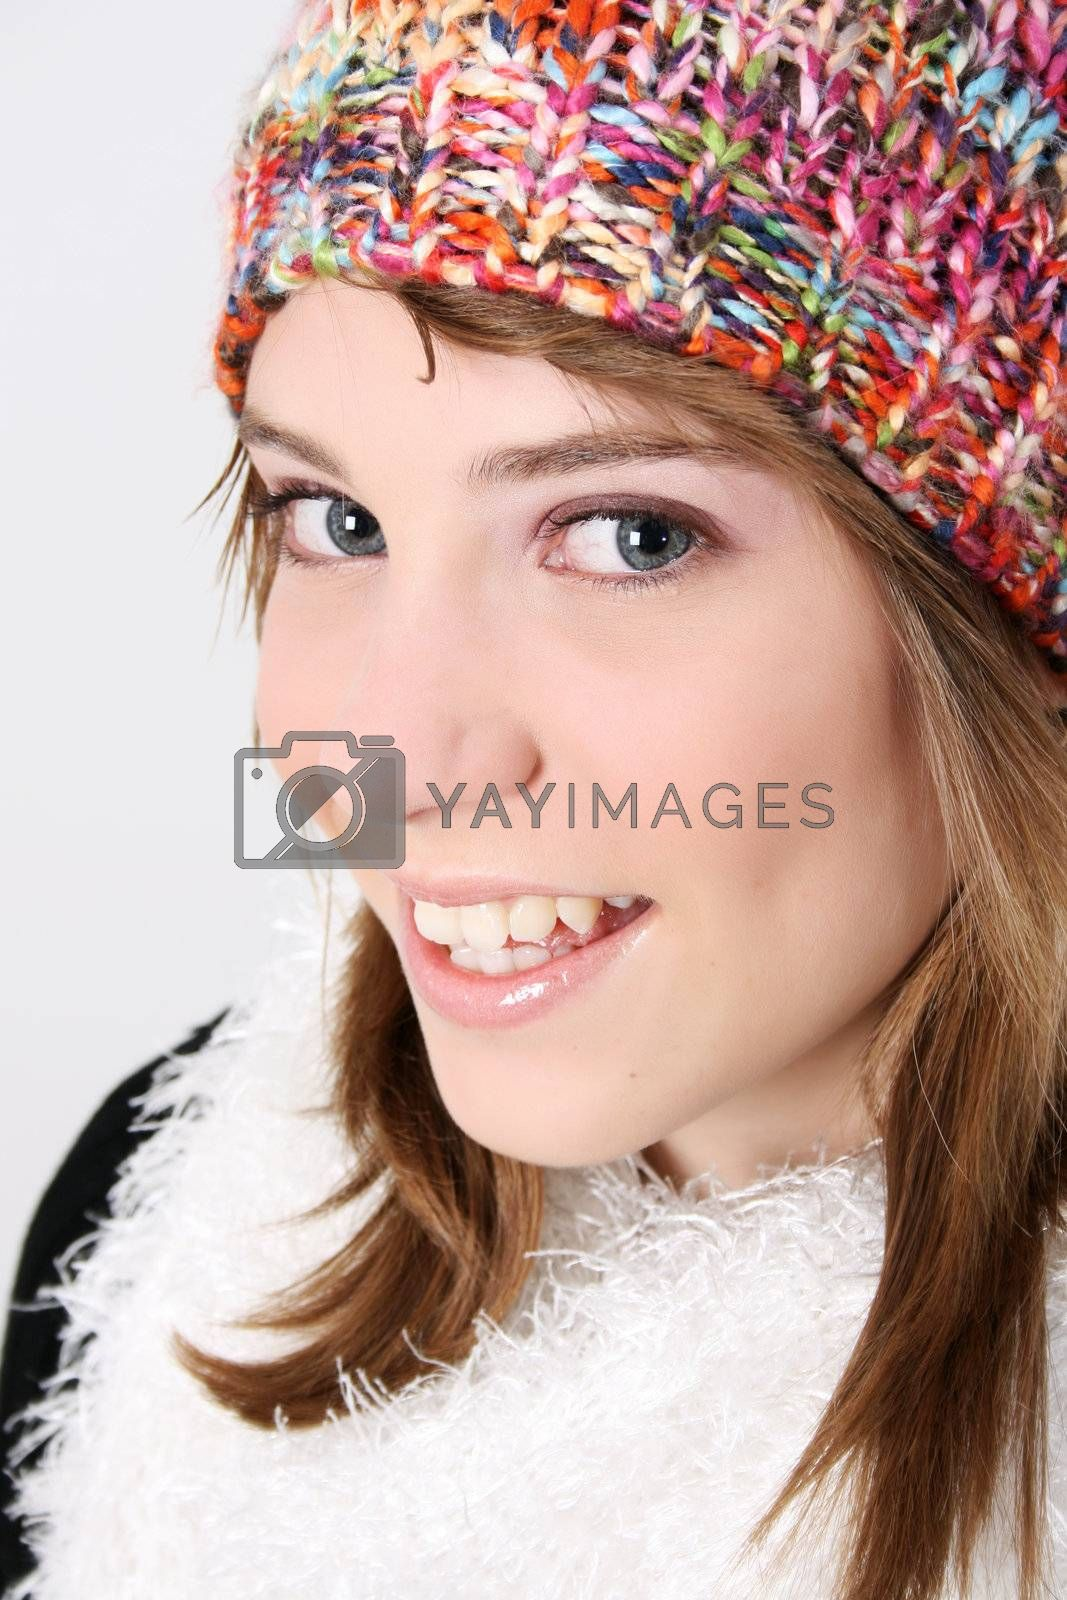 Beautiful young teenager wearing warm winter clothing